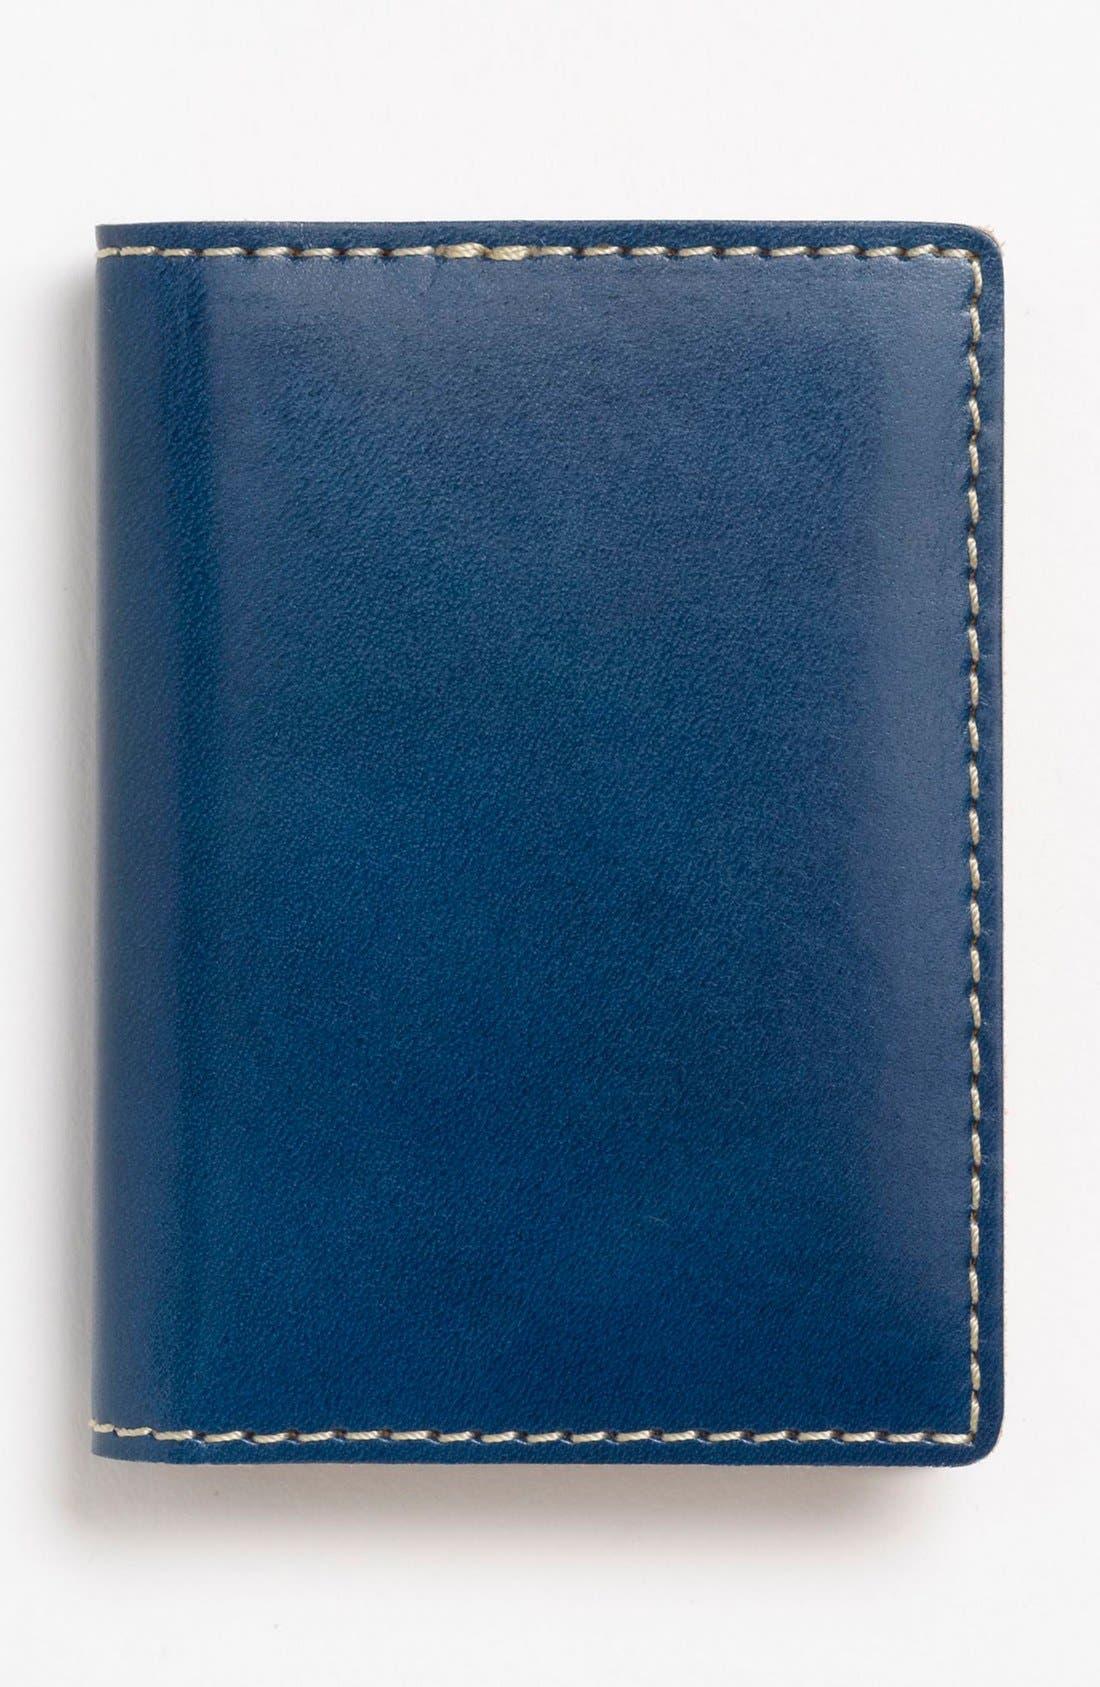 Main Image - J Fold 'Superglaze' Folding Card Holder